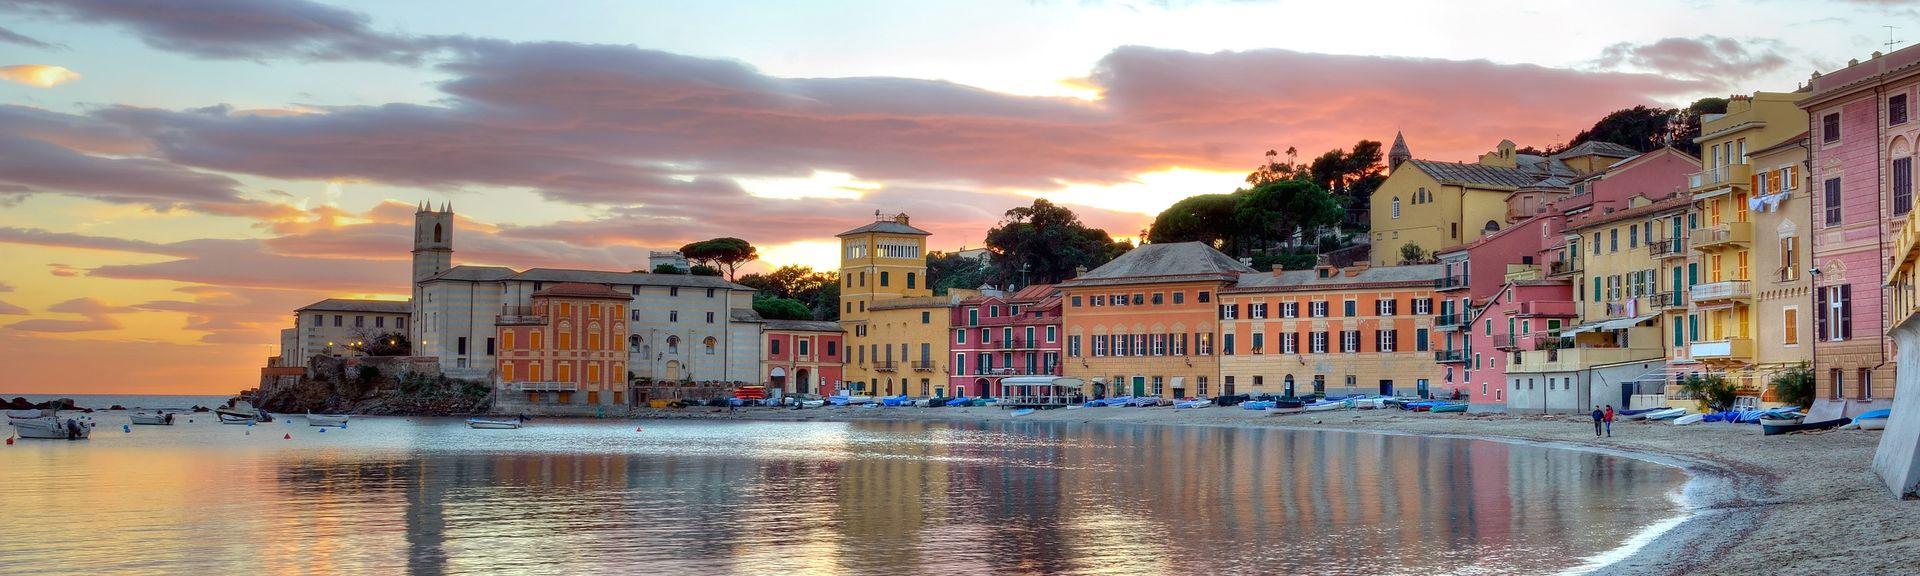 Sestri Levante, Ligurien, Italien